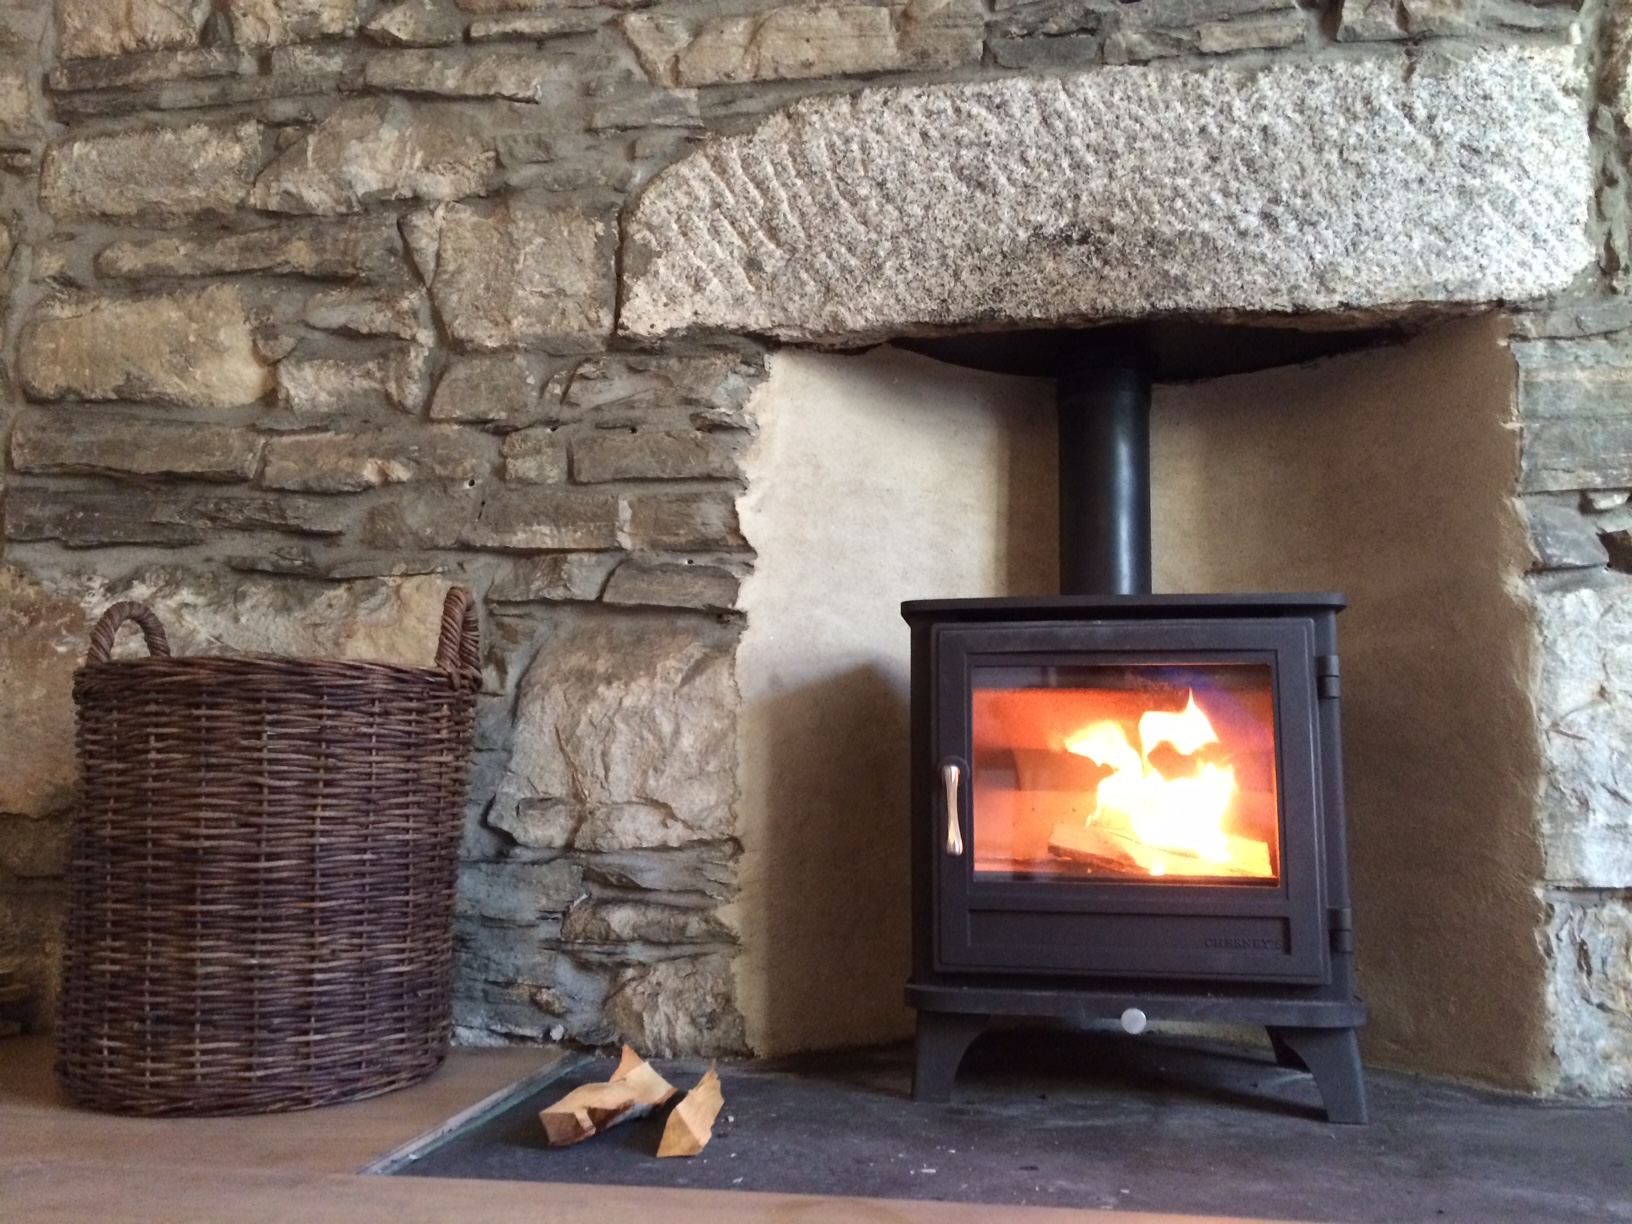 Log burning stove with wood/ kindling provided